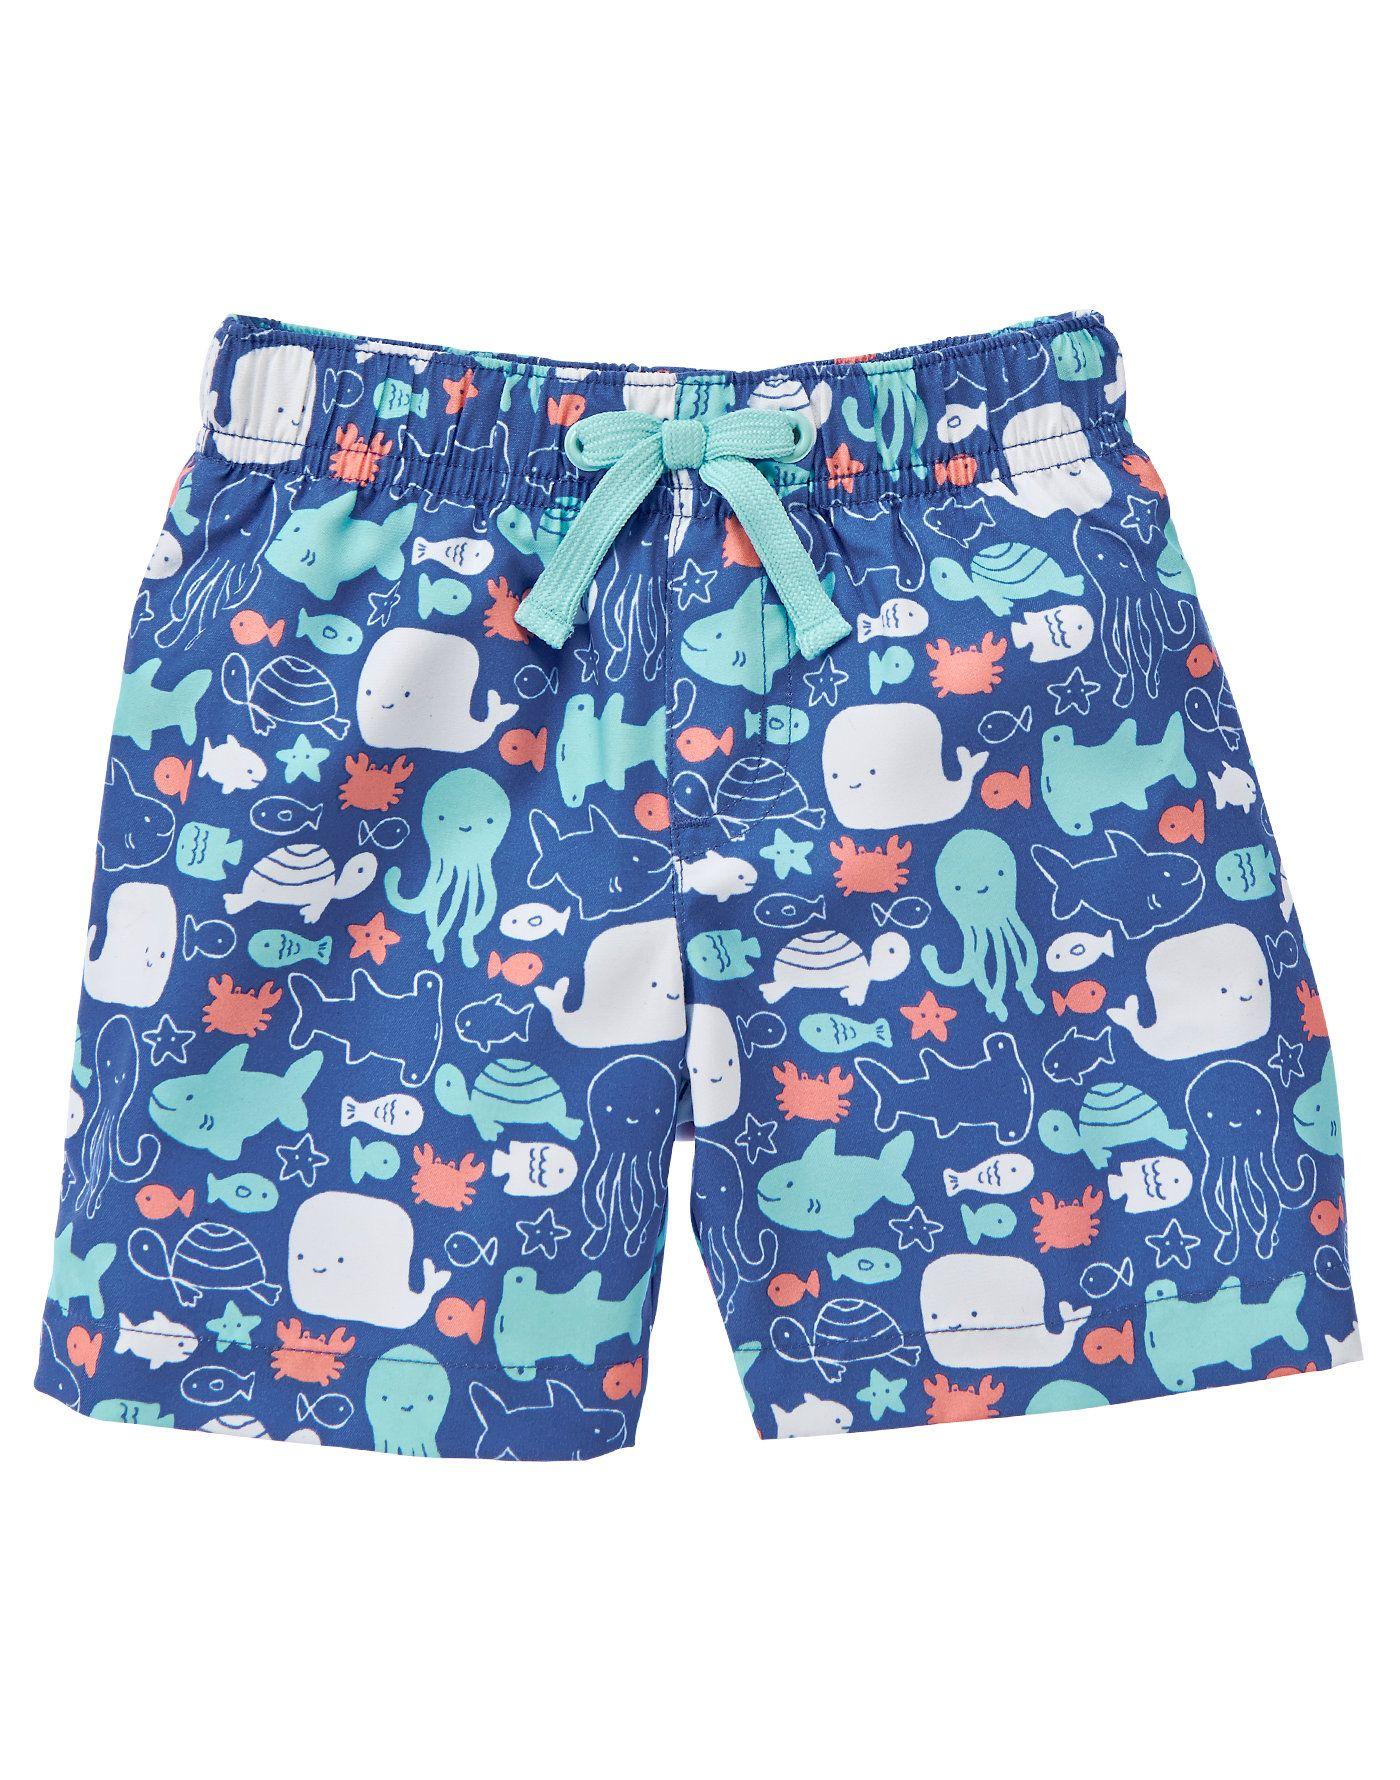 NWT Gymboree SEA SPLASH Floral Woven Shorts